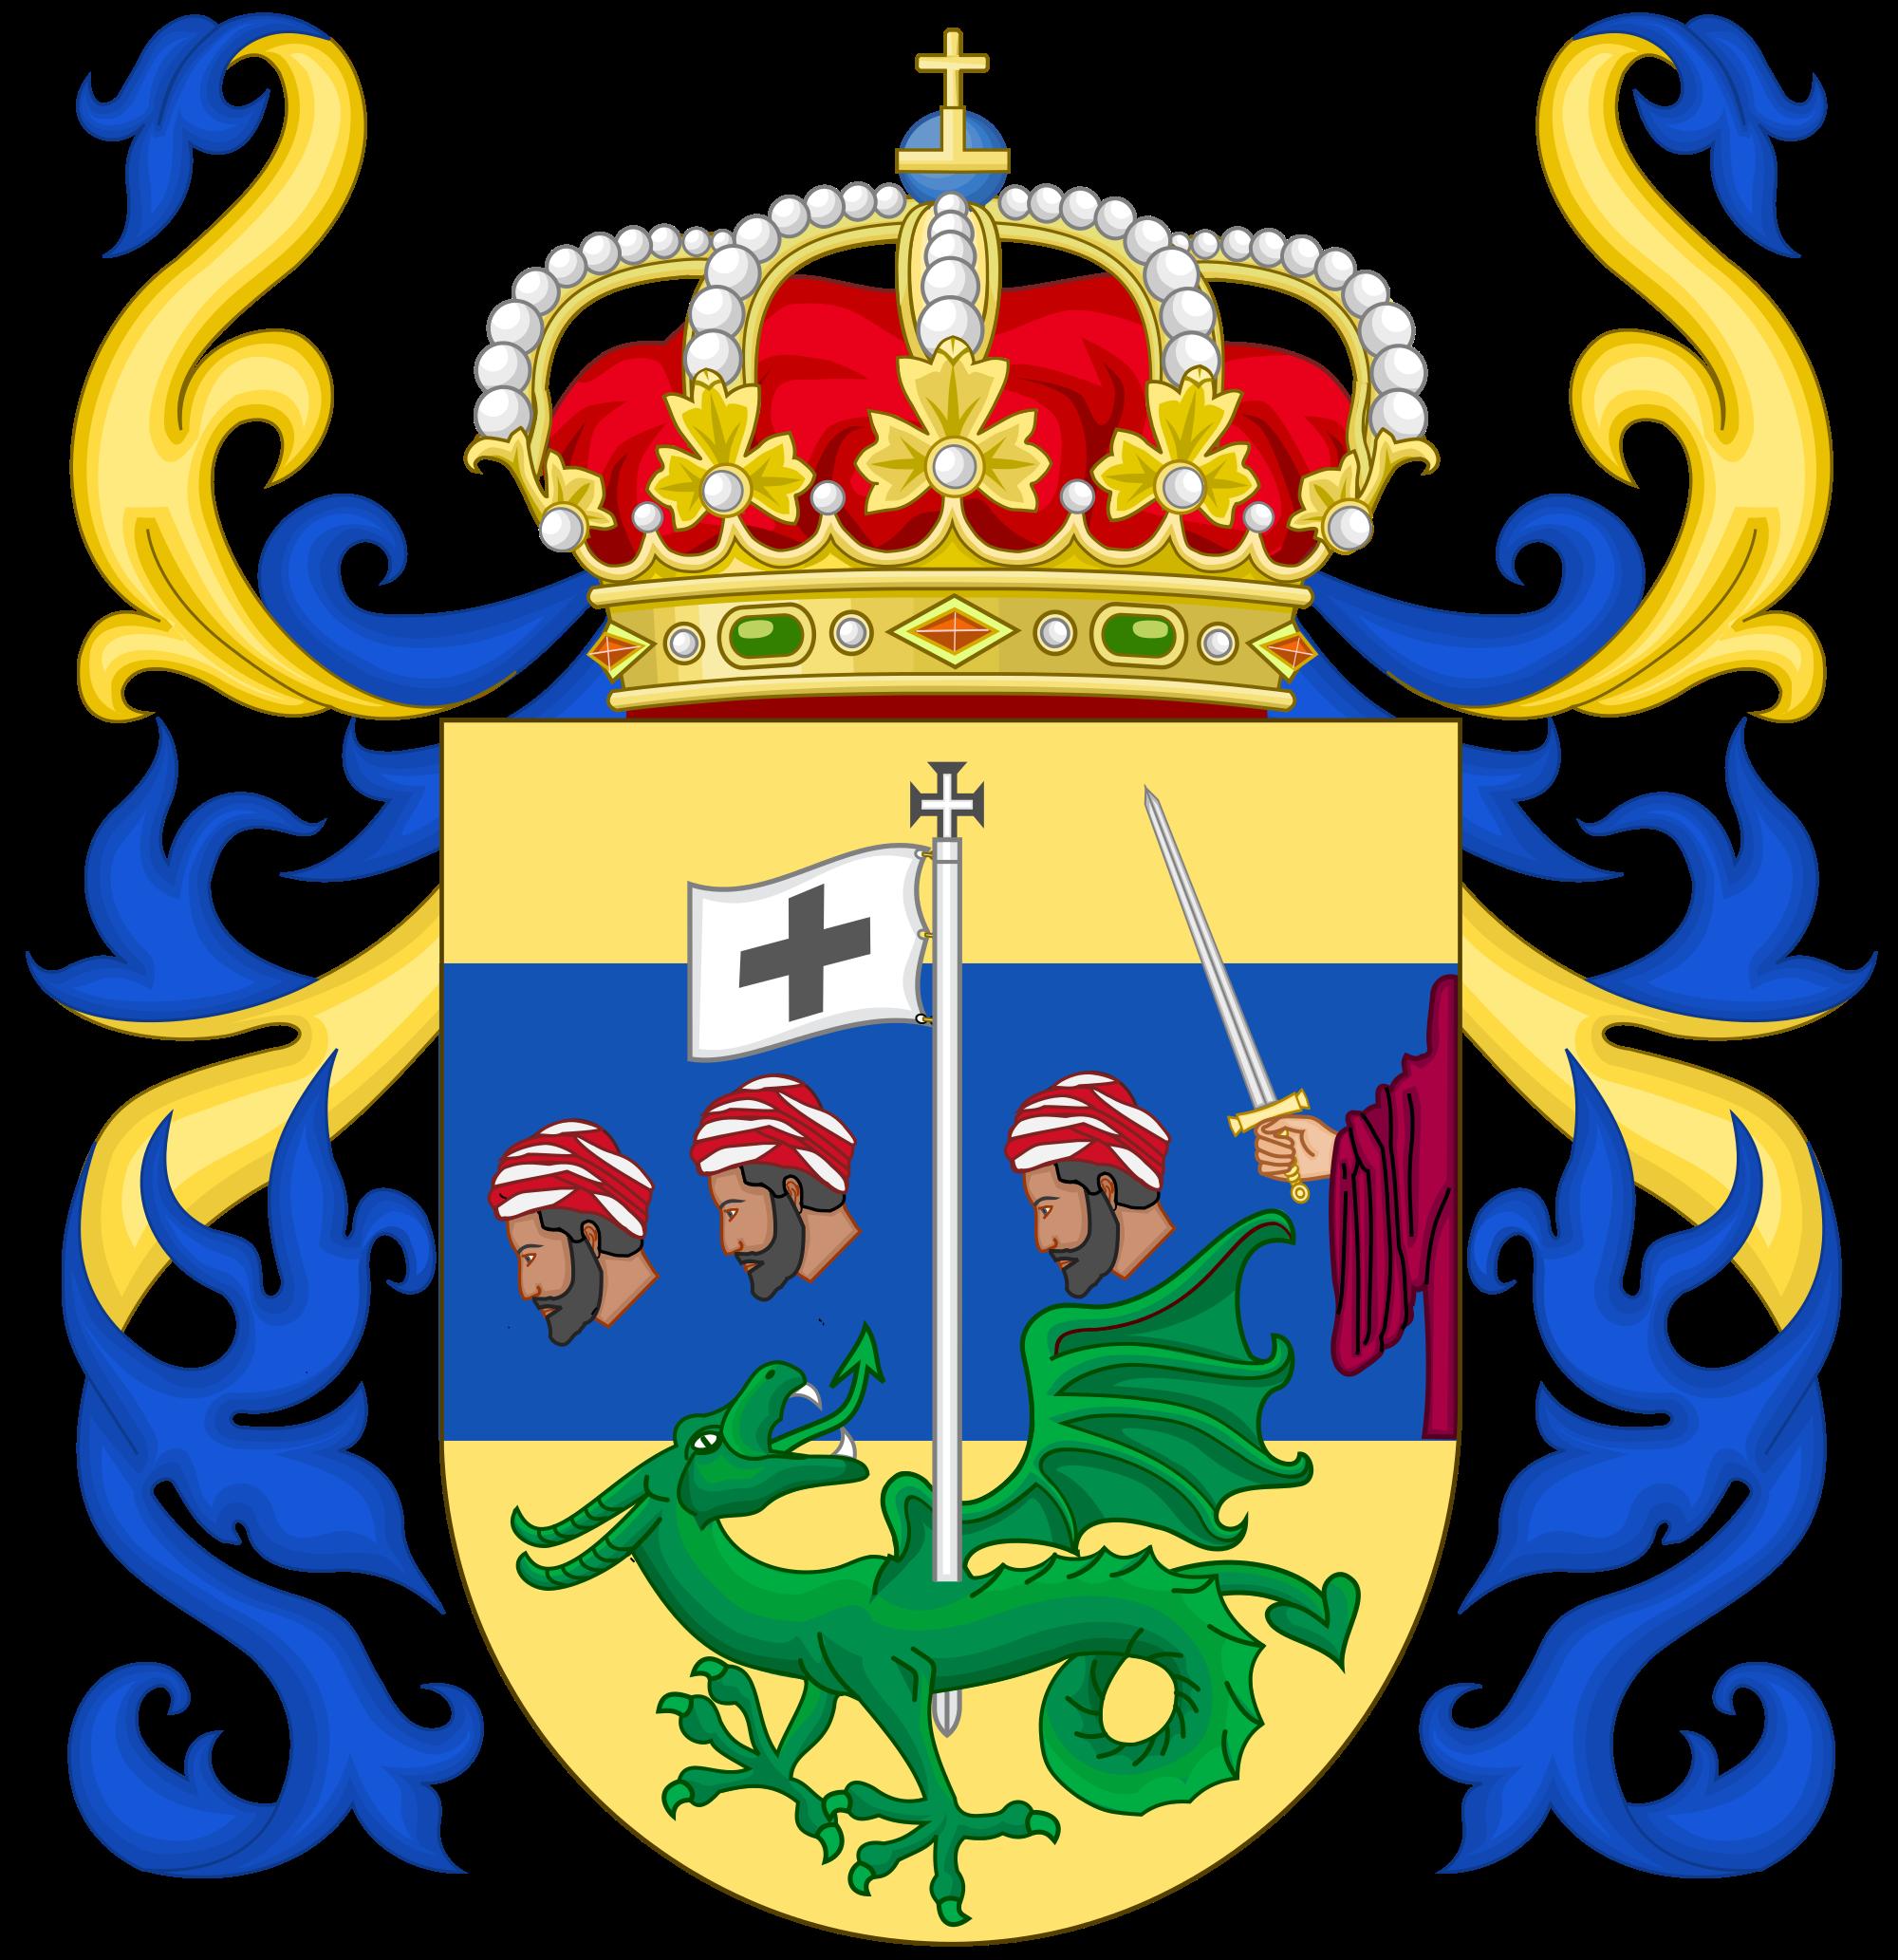 File:Coat of Arms of San Millán de la Cogolla.svg.